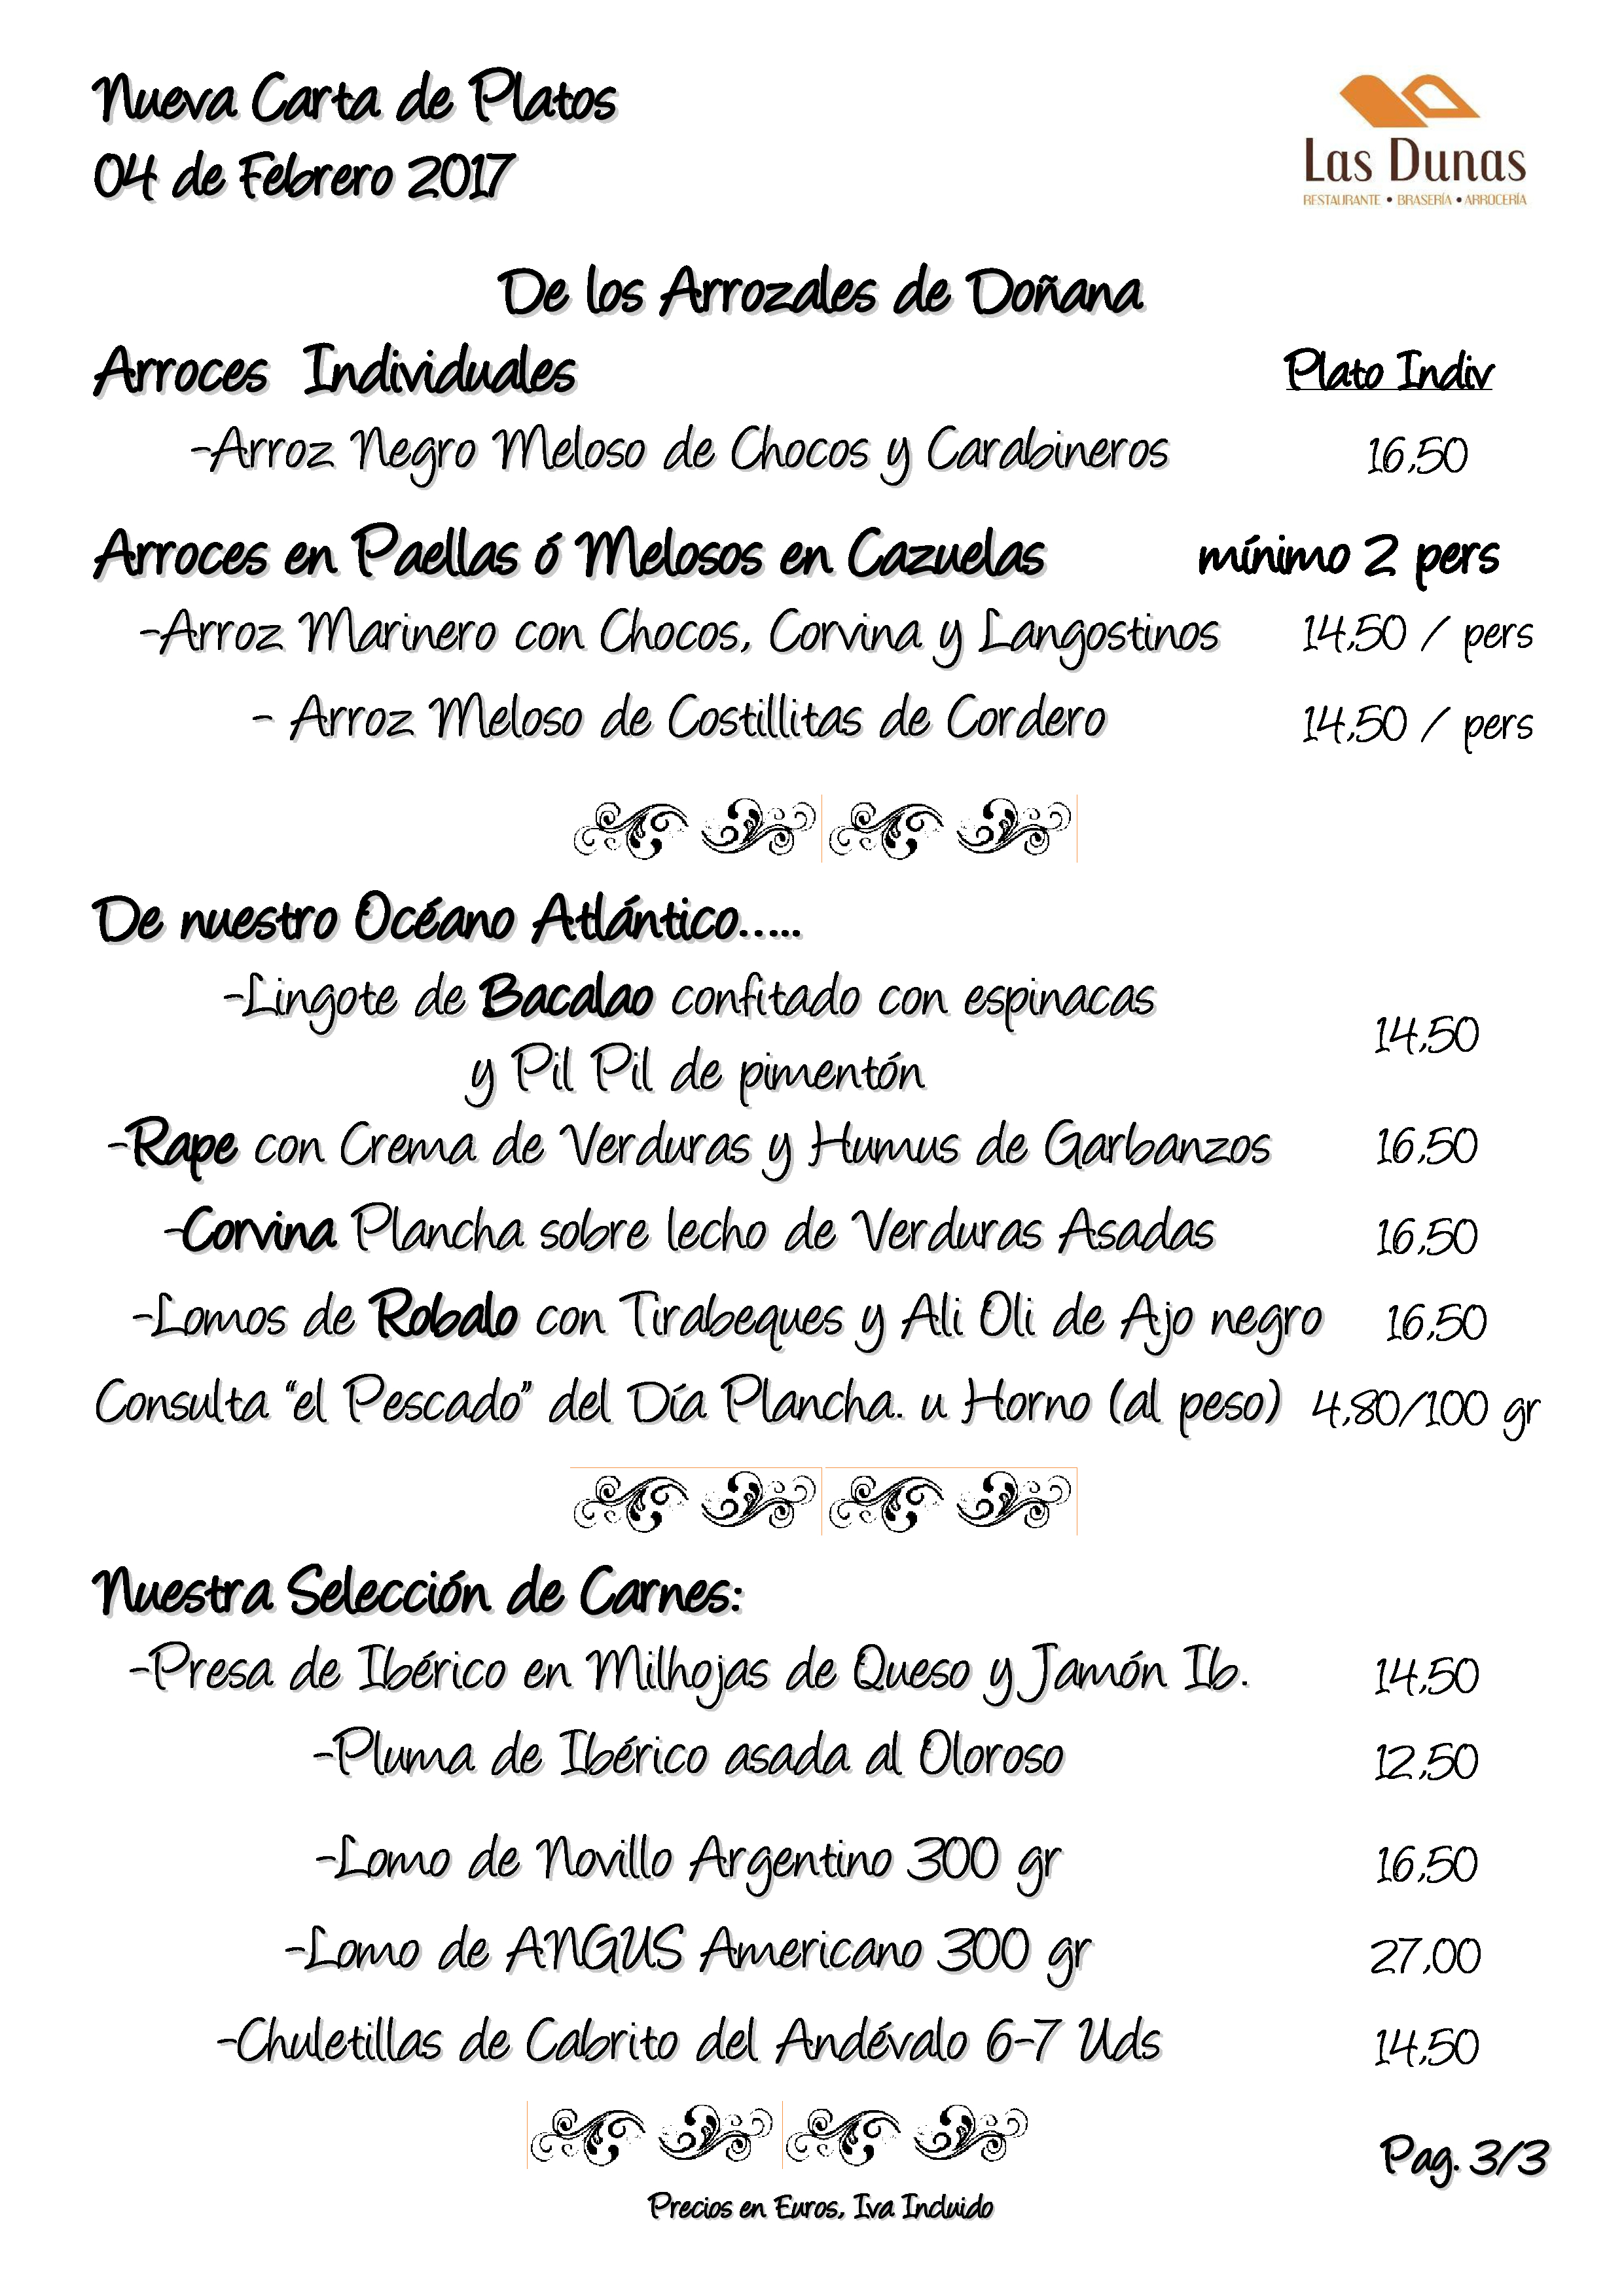 Restaurante Las Dunas Carta